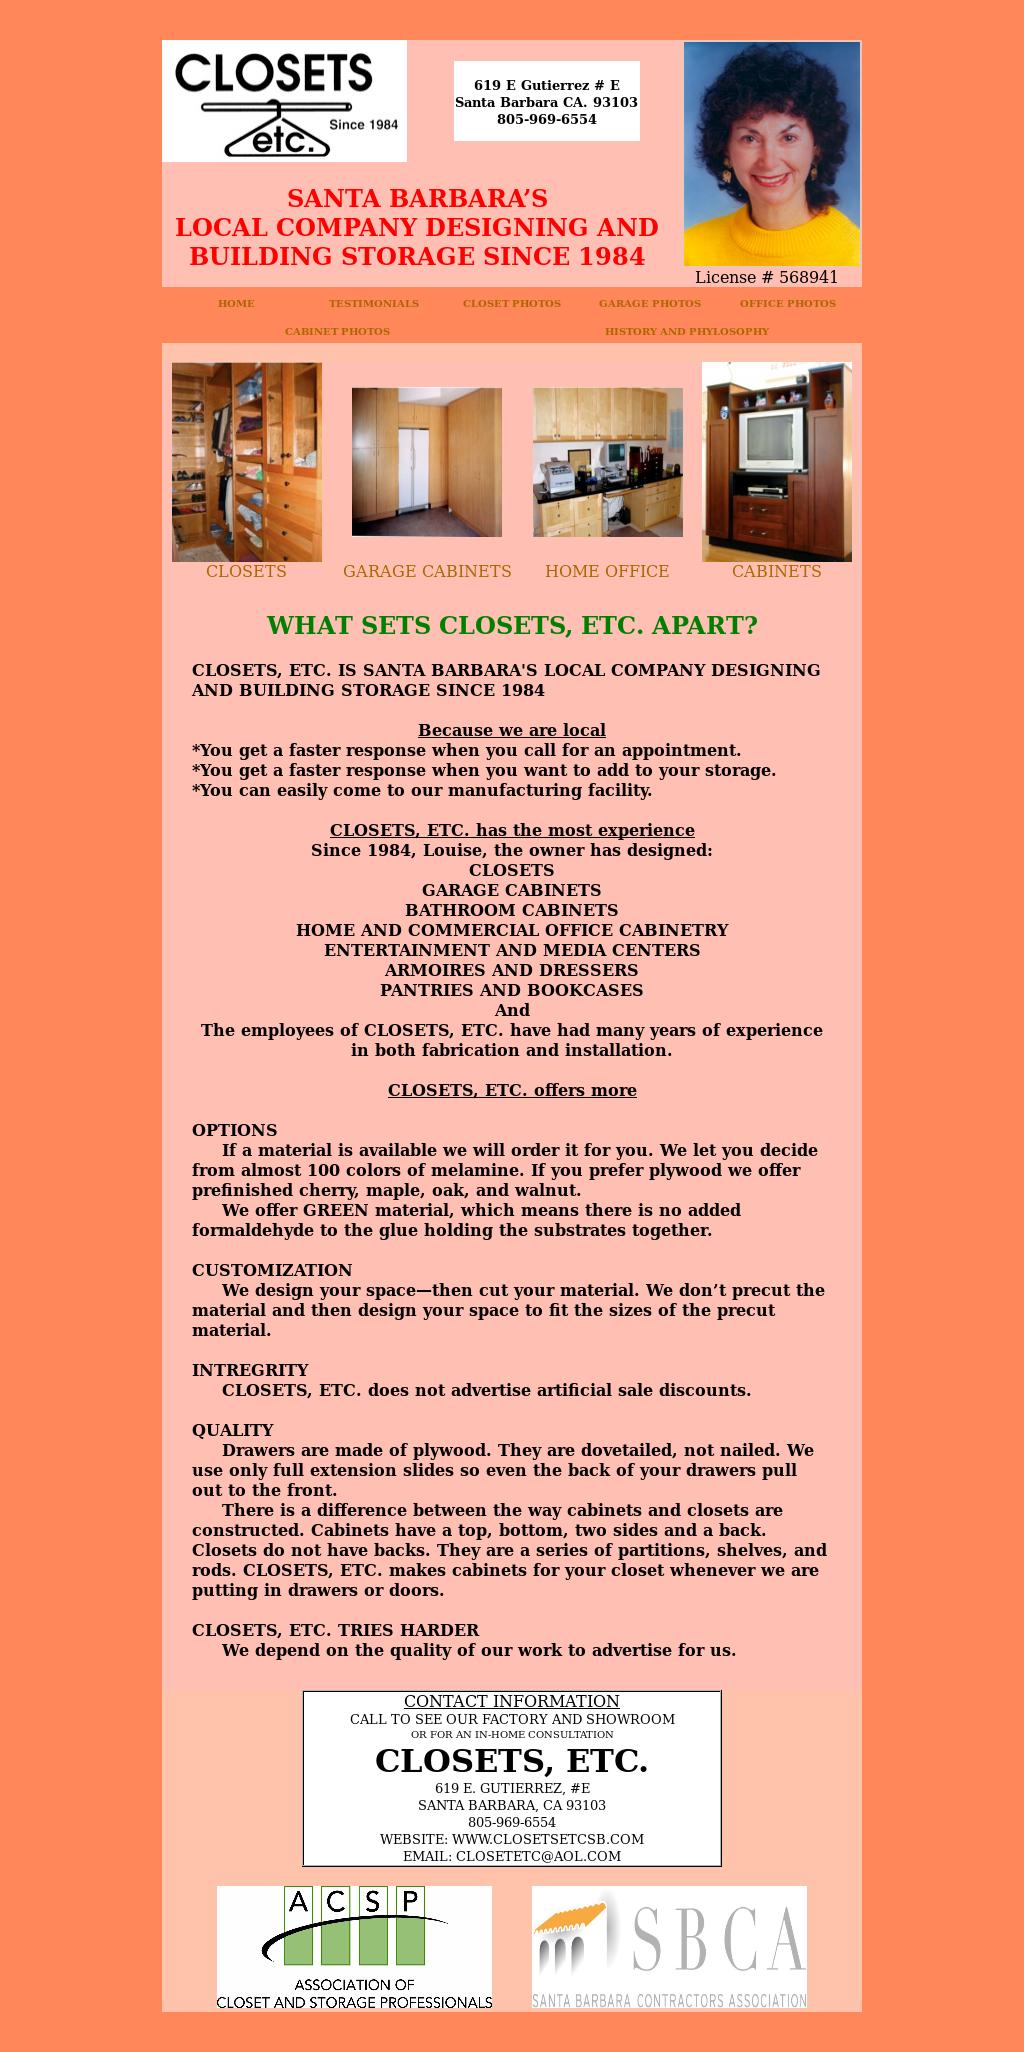 CLOSETS ETC Website History